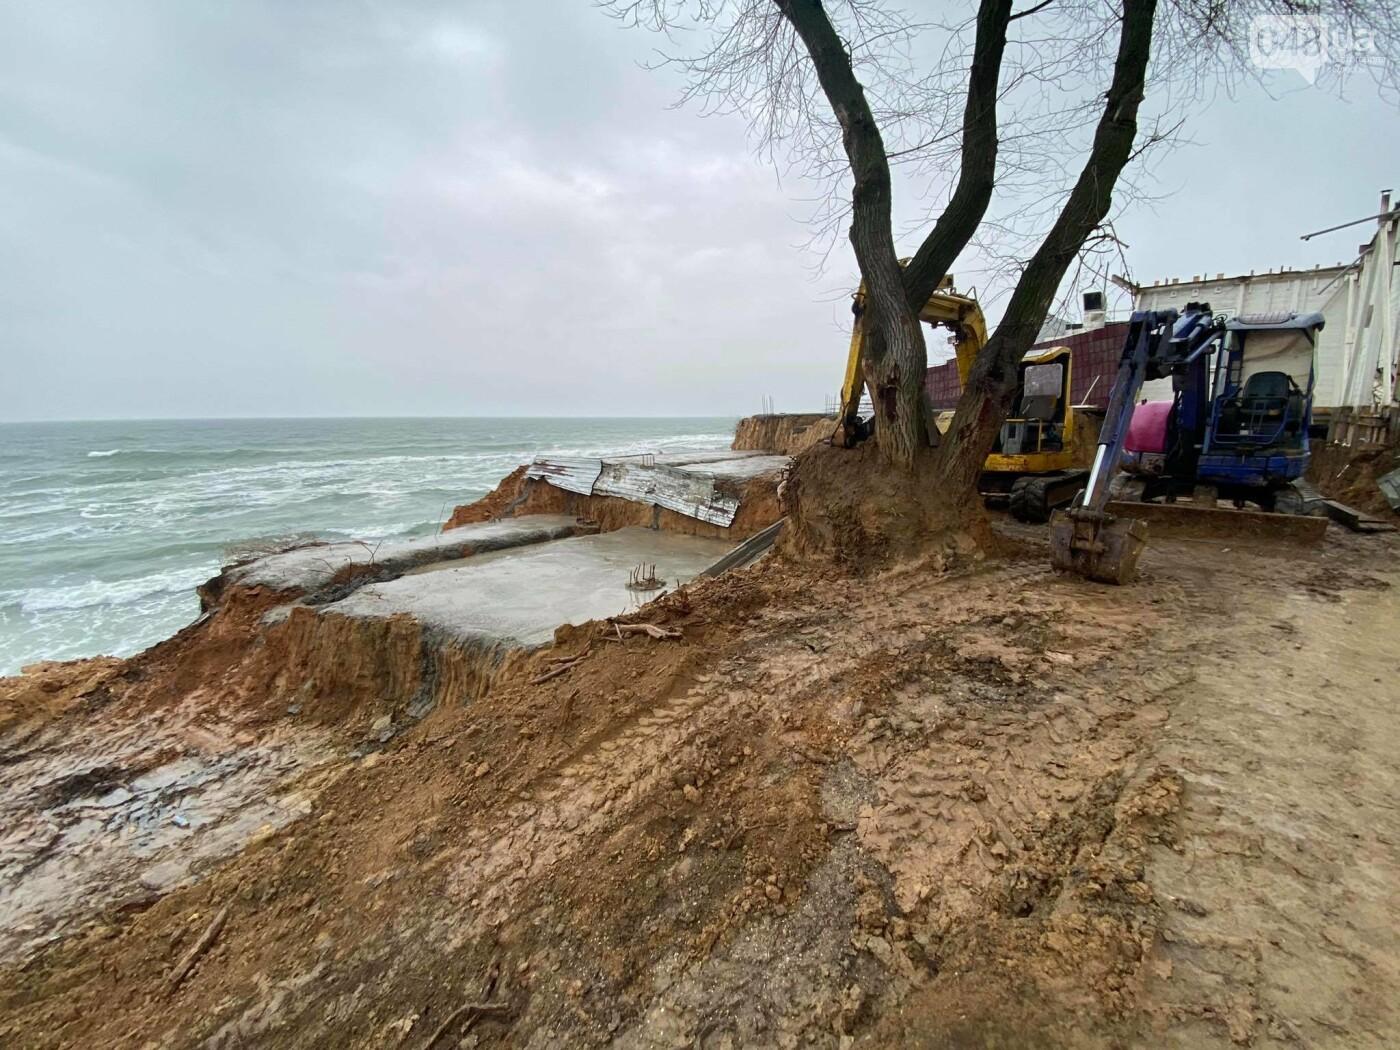 В Аркадии на побережье активист нашел незаконную стройку,- ФОТО, ВИДЕО, фото-3